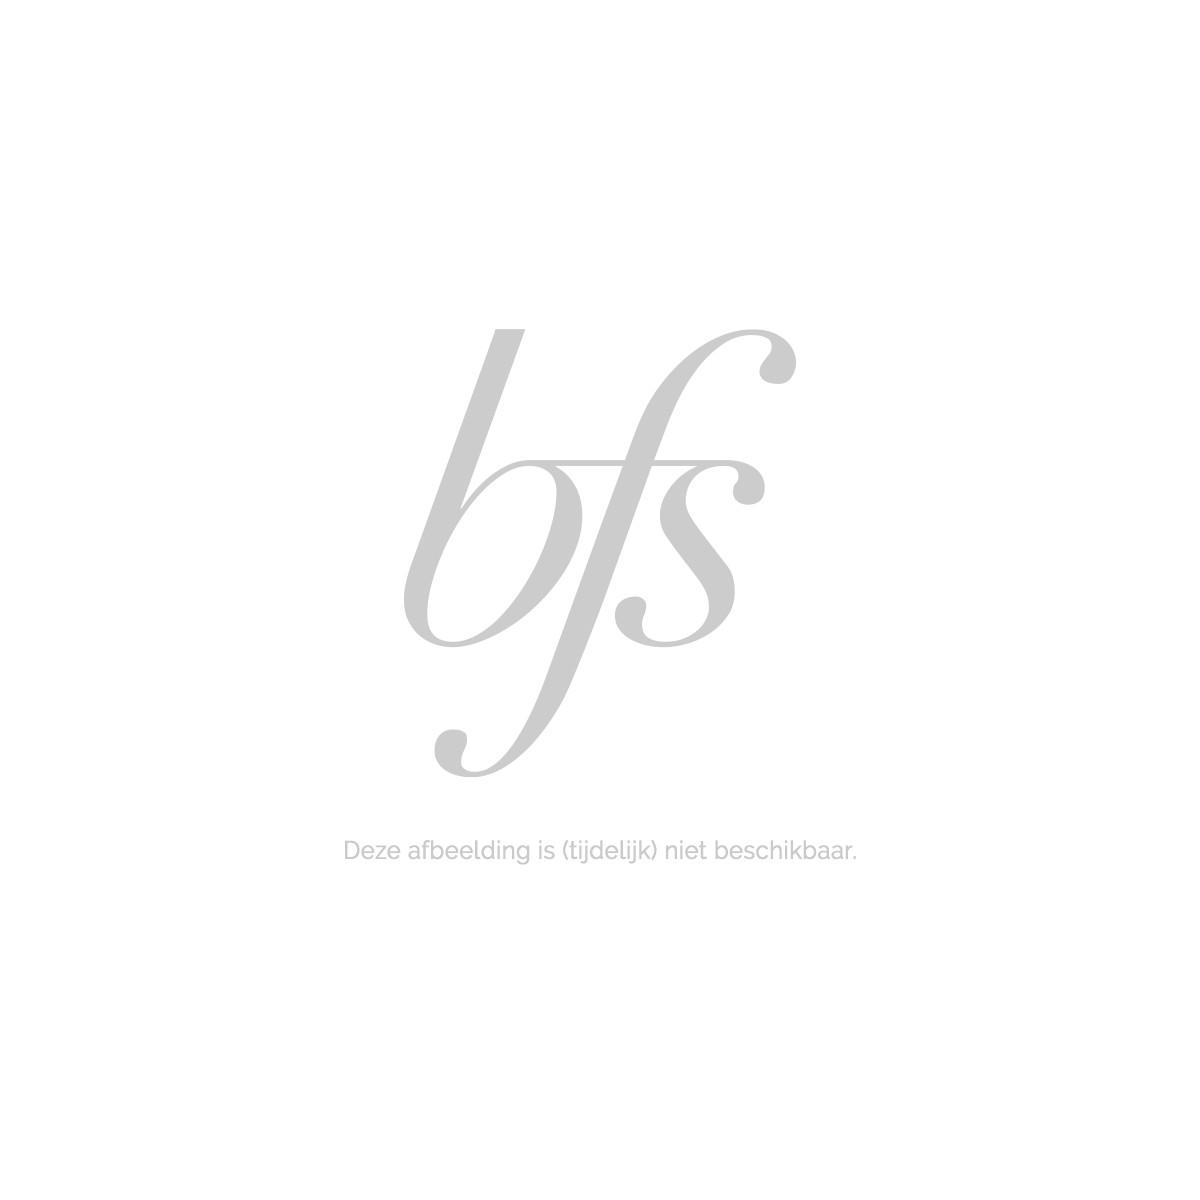 Christian Dior Contour Transparent Lipliner 5,50 Ml